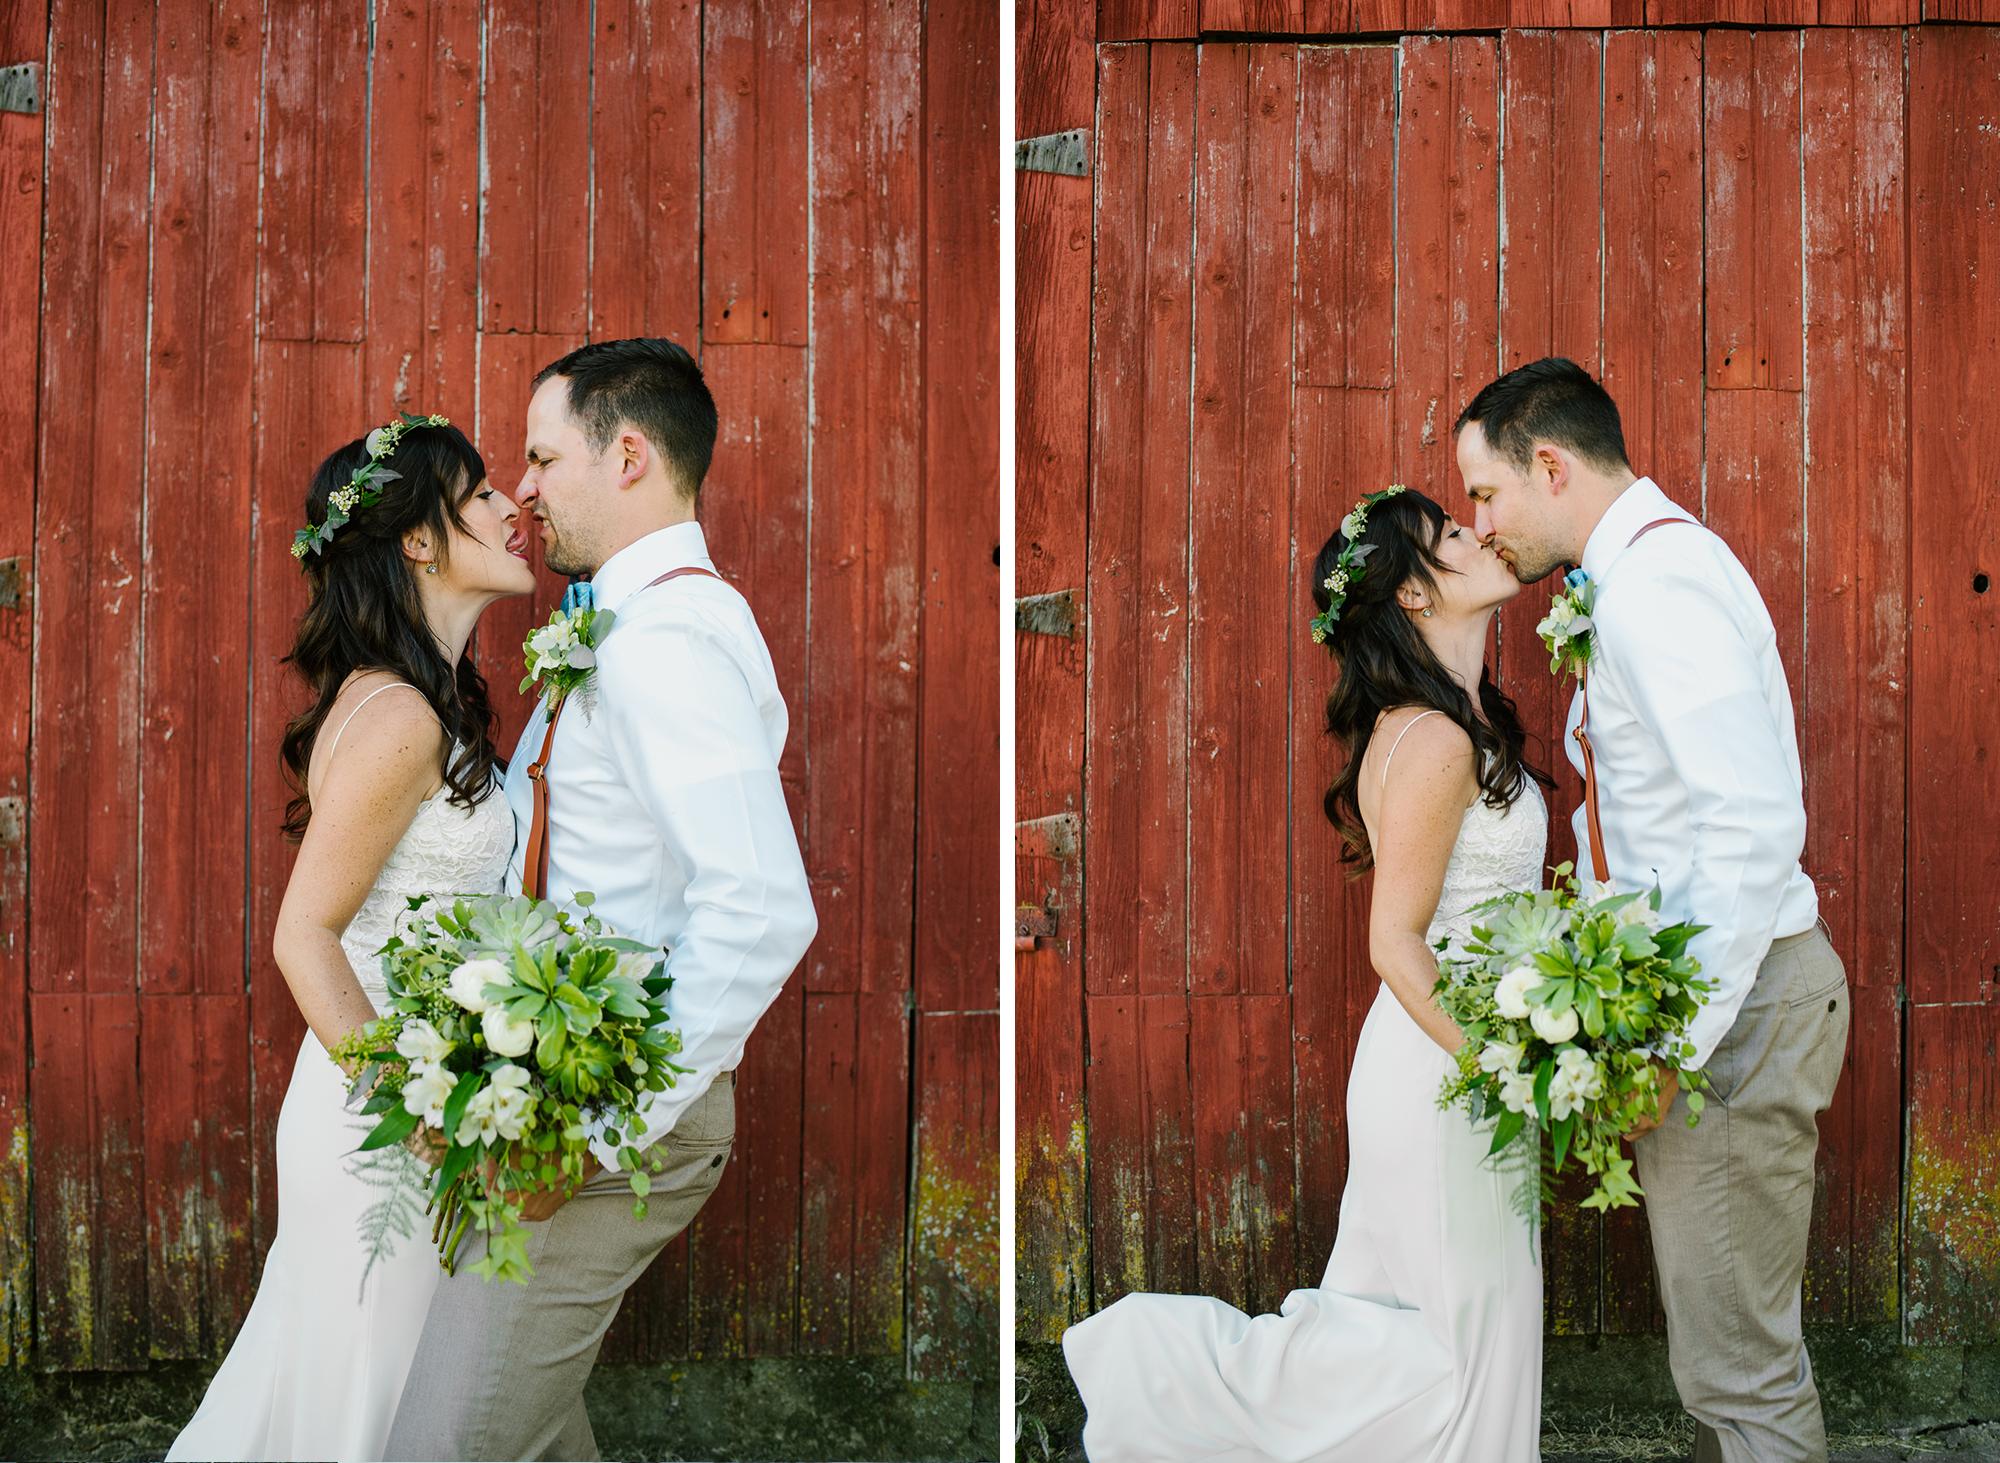 bride-groom-barn-michigan-wedding-photographer-sydney-marie.png